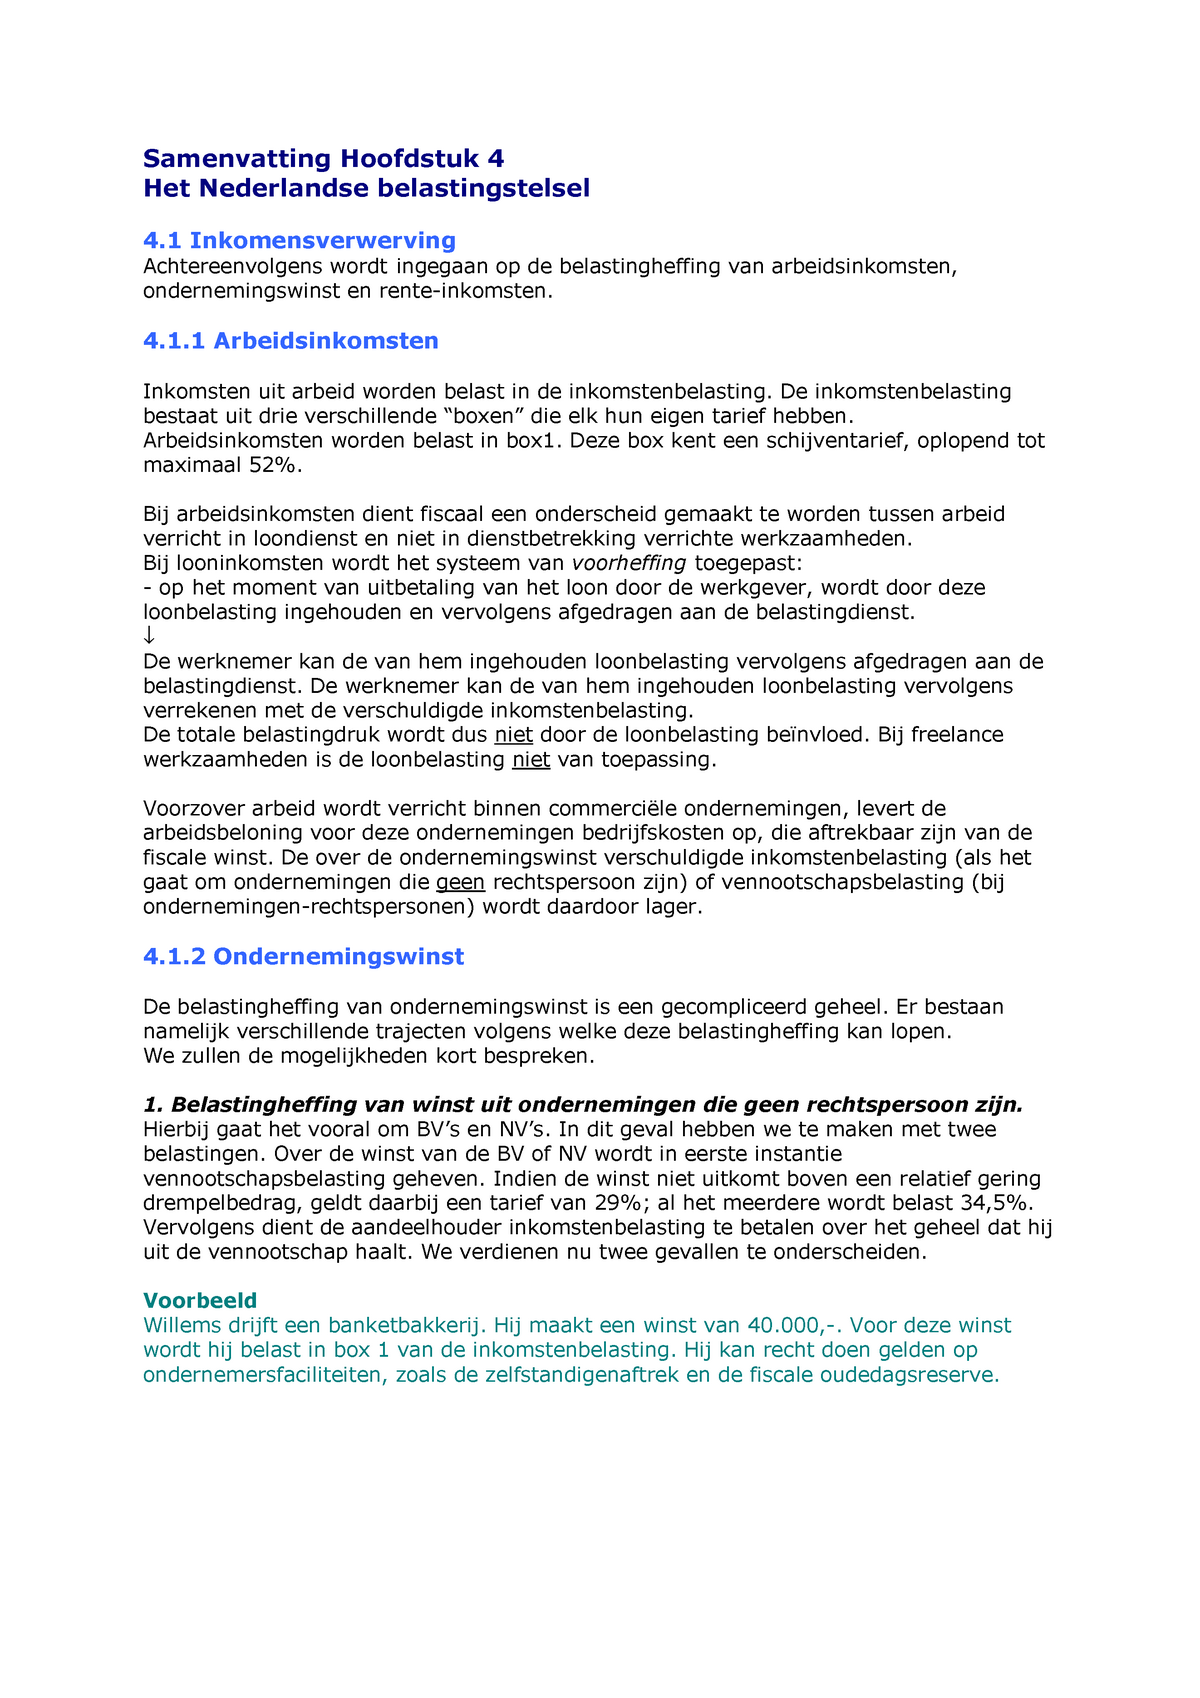 Samenvatting Belastingrecht - Het Nederlandse